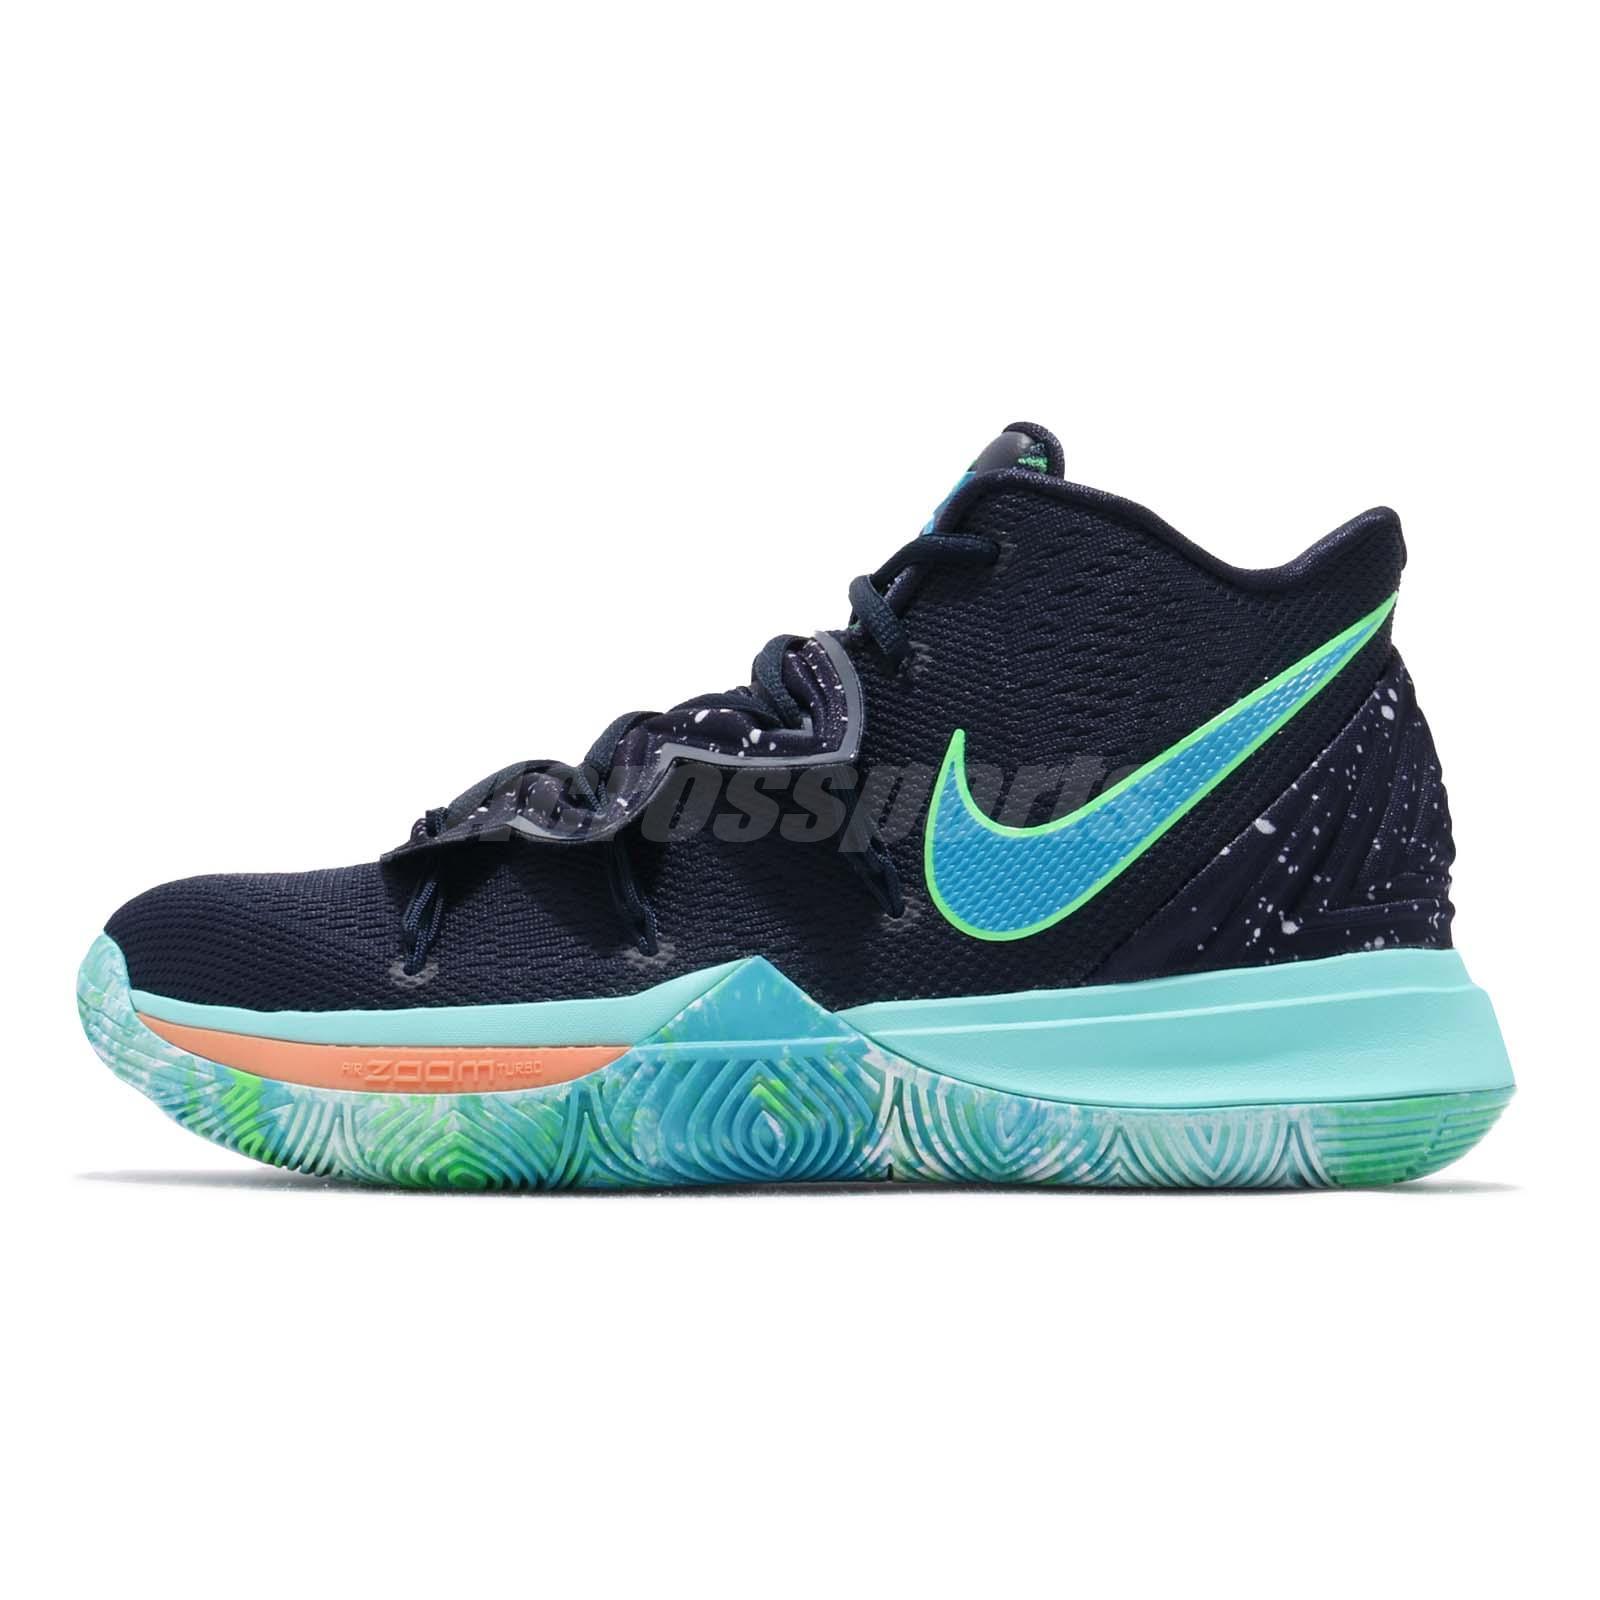 super popular eb3a0 9d48e Nike Kyrie 5 EP UFO Obsidian Blue Mens Basketball Shoes Kyrie Irving  AO2919-400